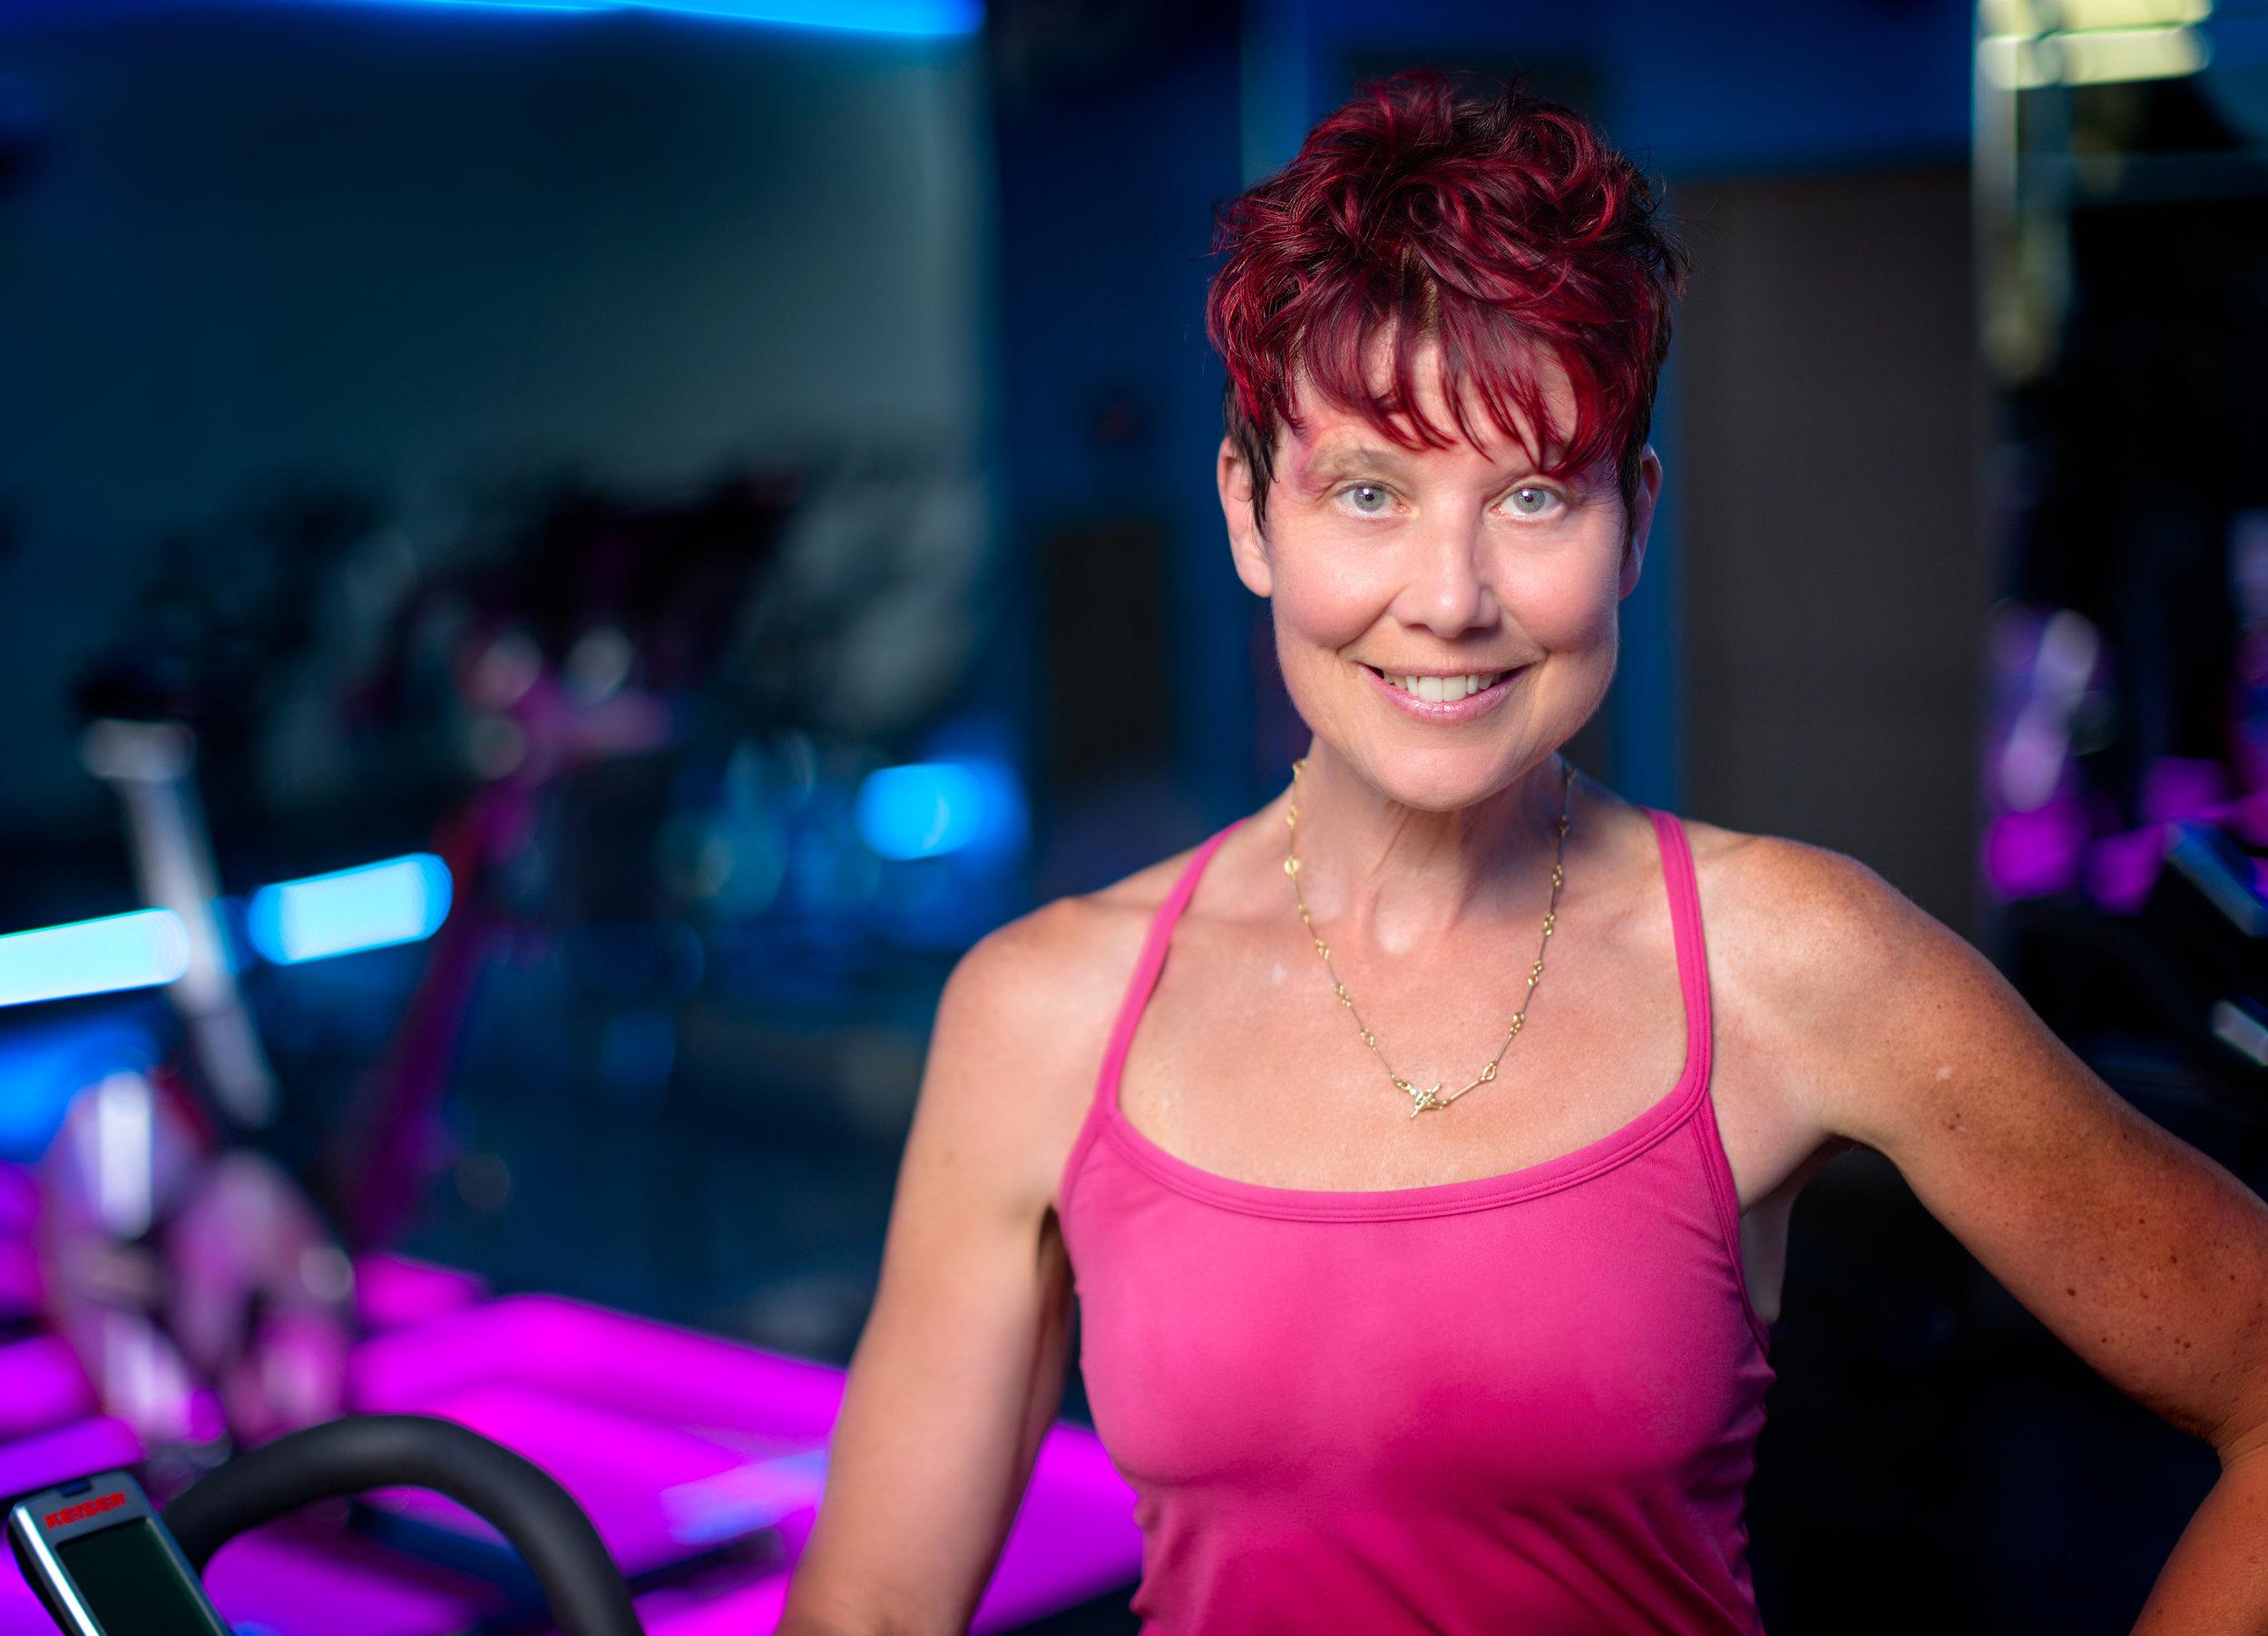 Fitness & Ride Instructor Elizabeth Sheinkopf